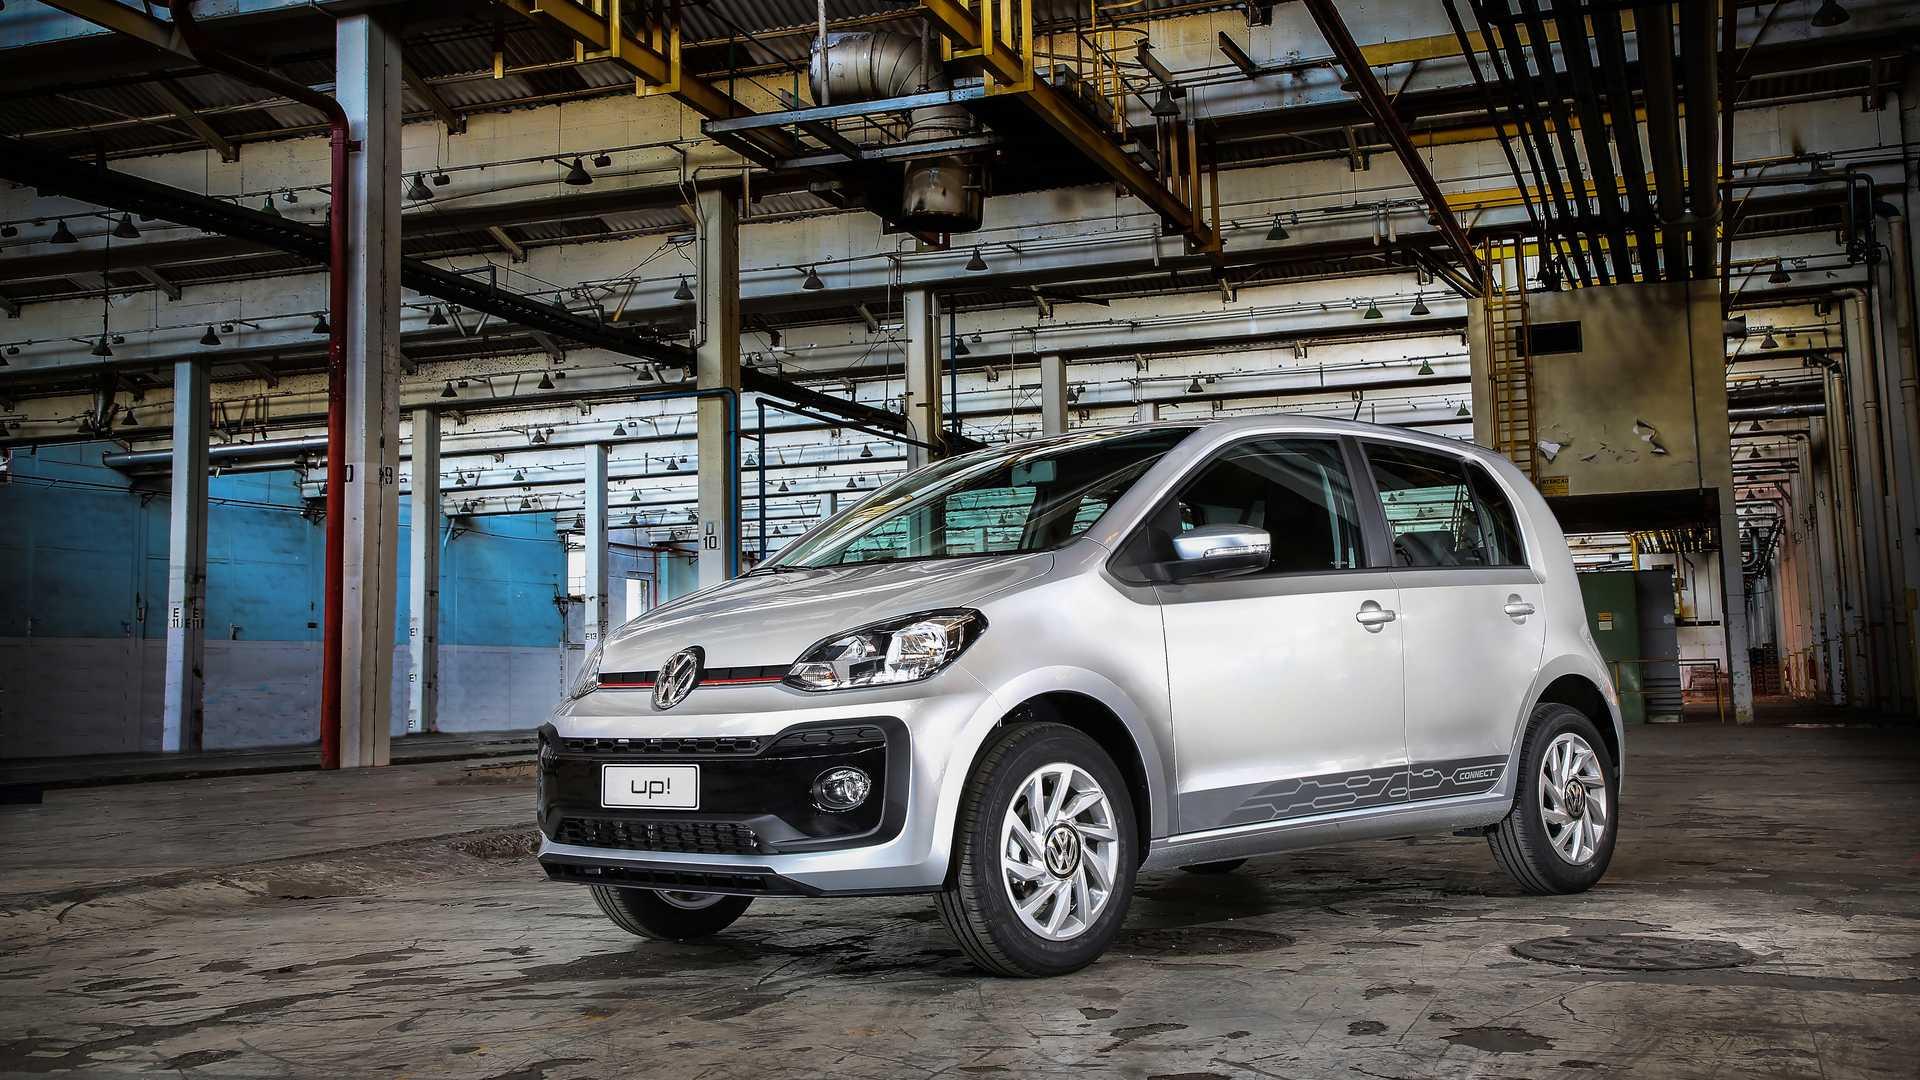 NEUES VW UP 2021 → Preis, Fotos, Verbrauch, Datenblatt